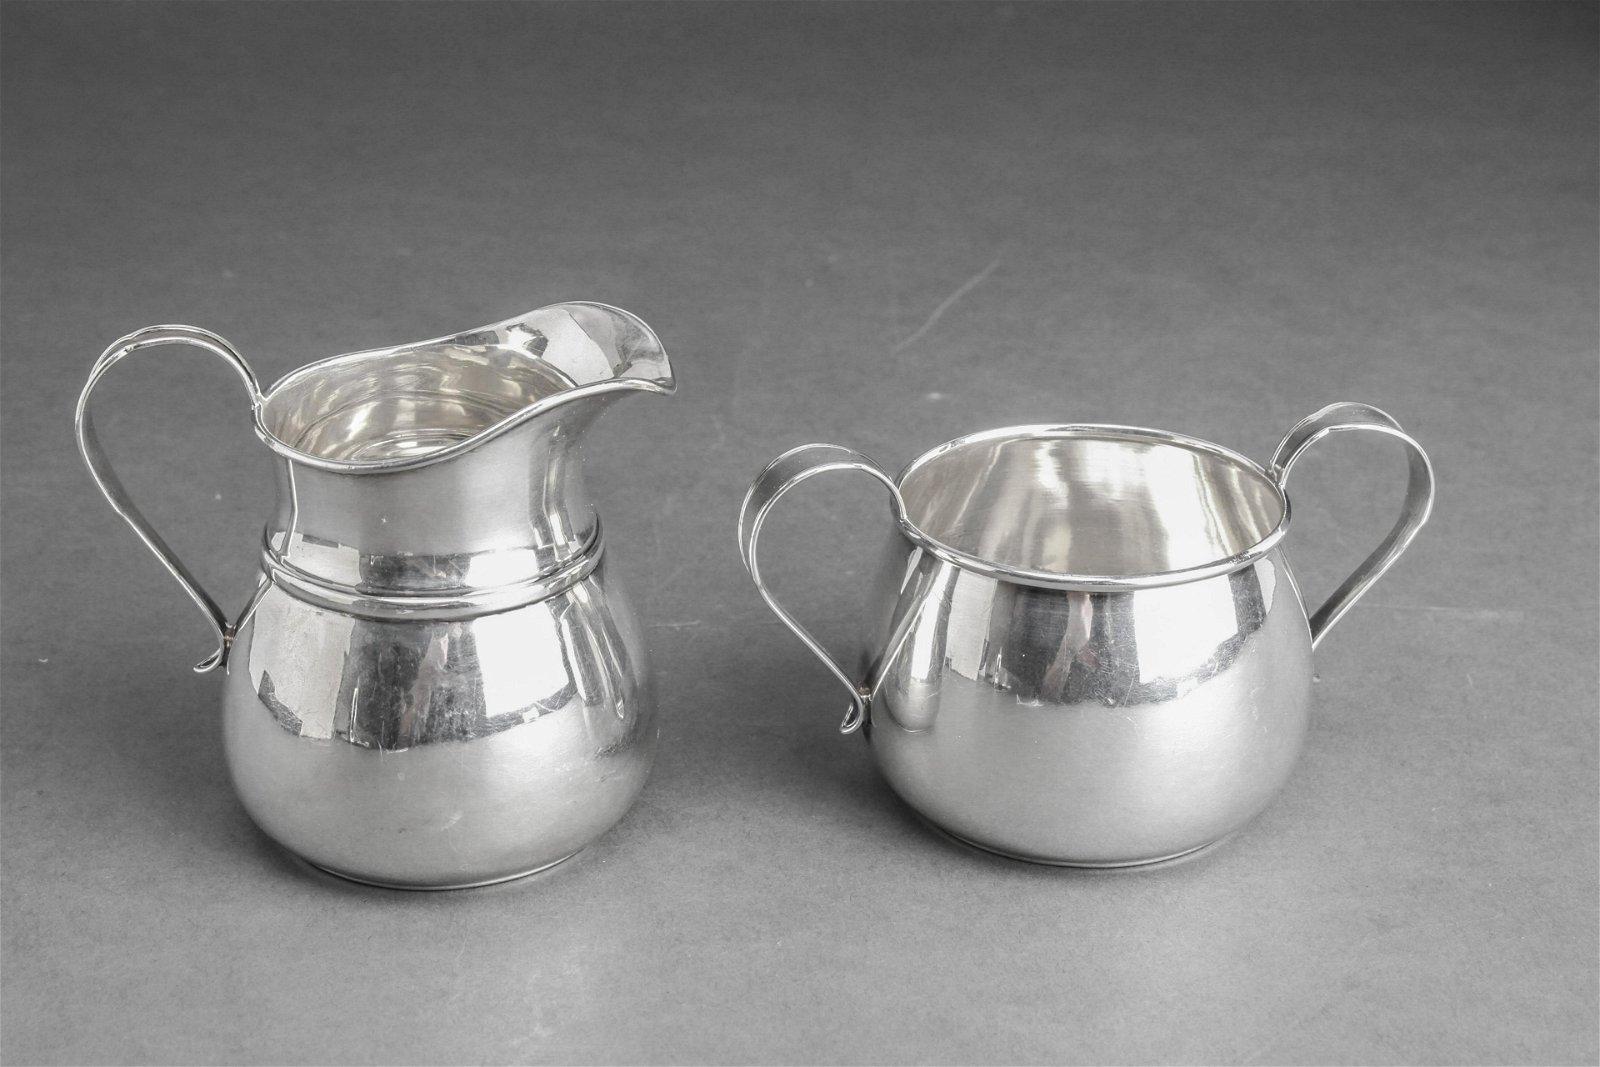 Webster Silver Sugar Bowl & Cream Pitcher Set 2